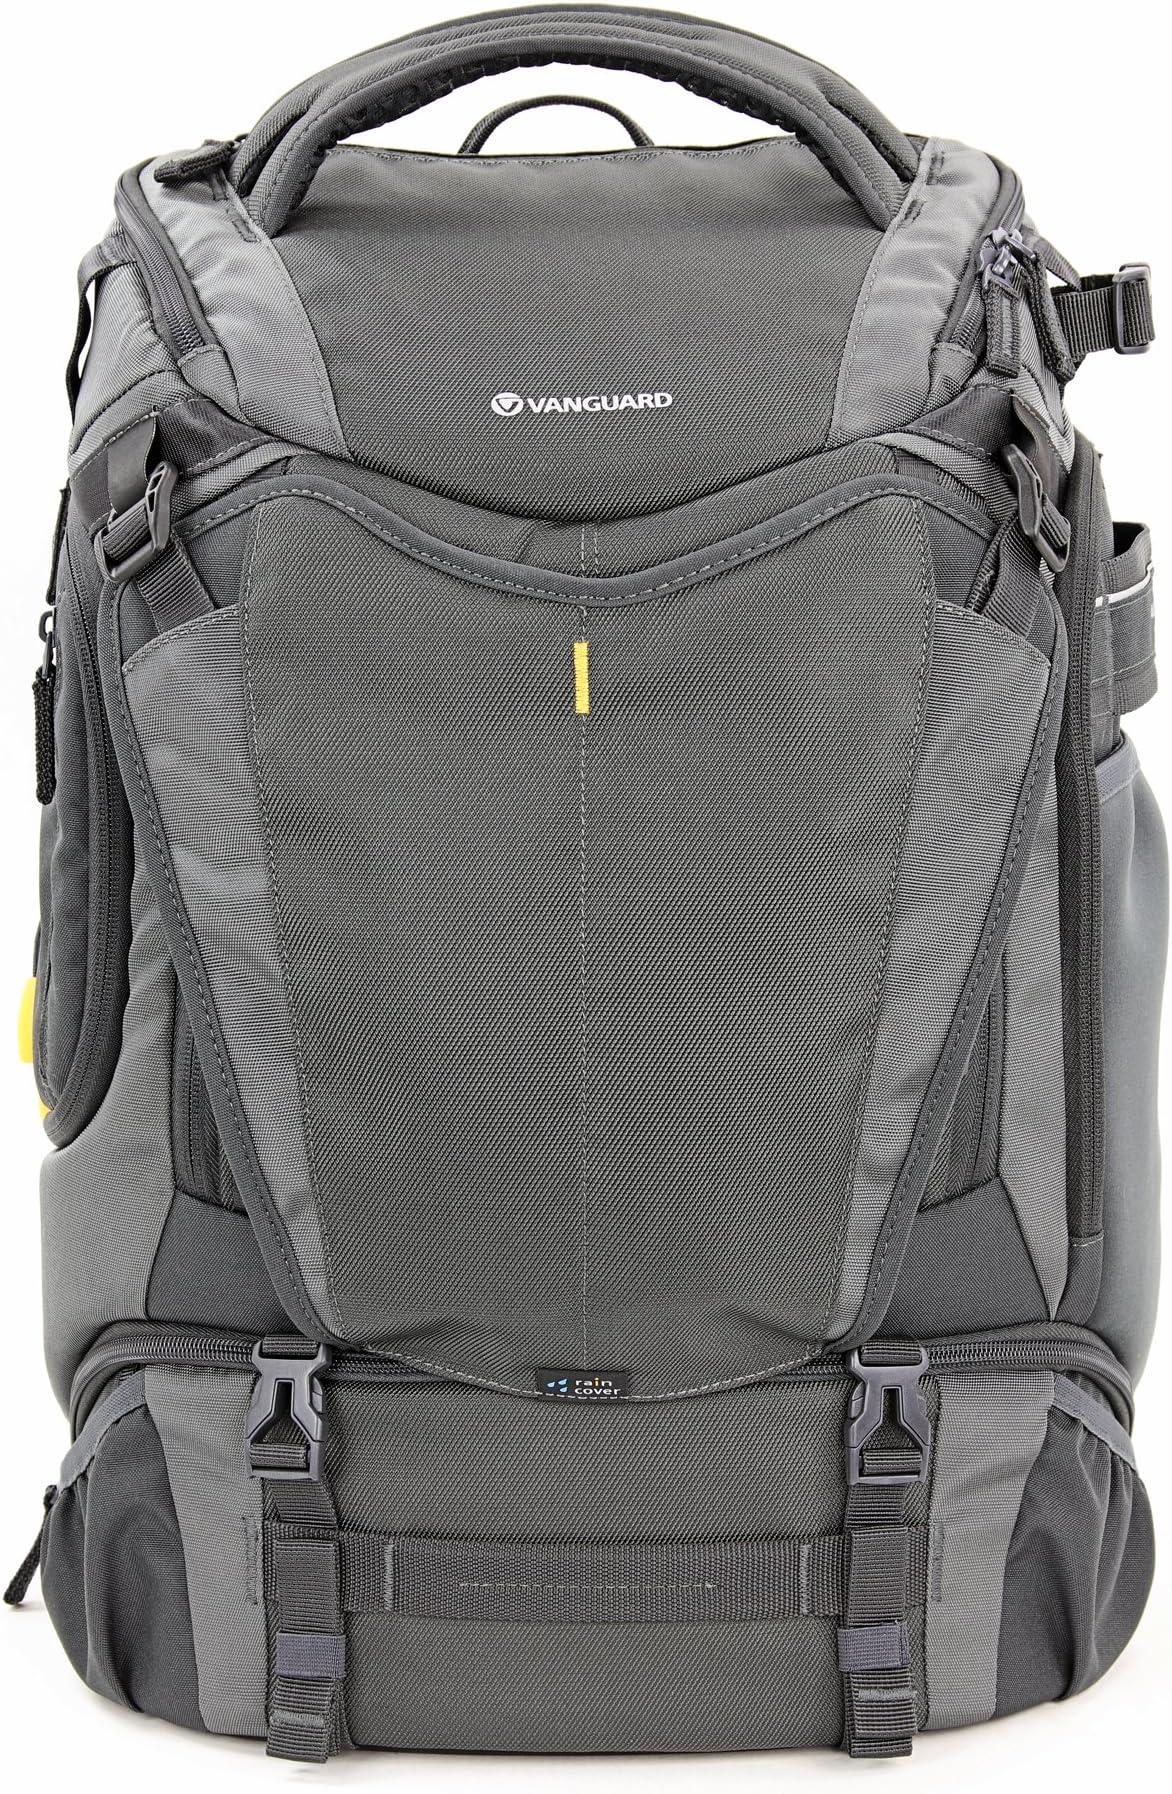 Vanguard Alta Sky 51D Camera Backpack for Sony, Nikon, Canon, DSLR, Drones